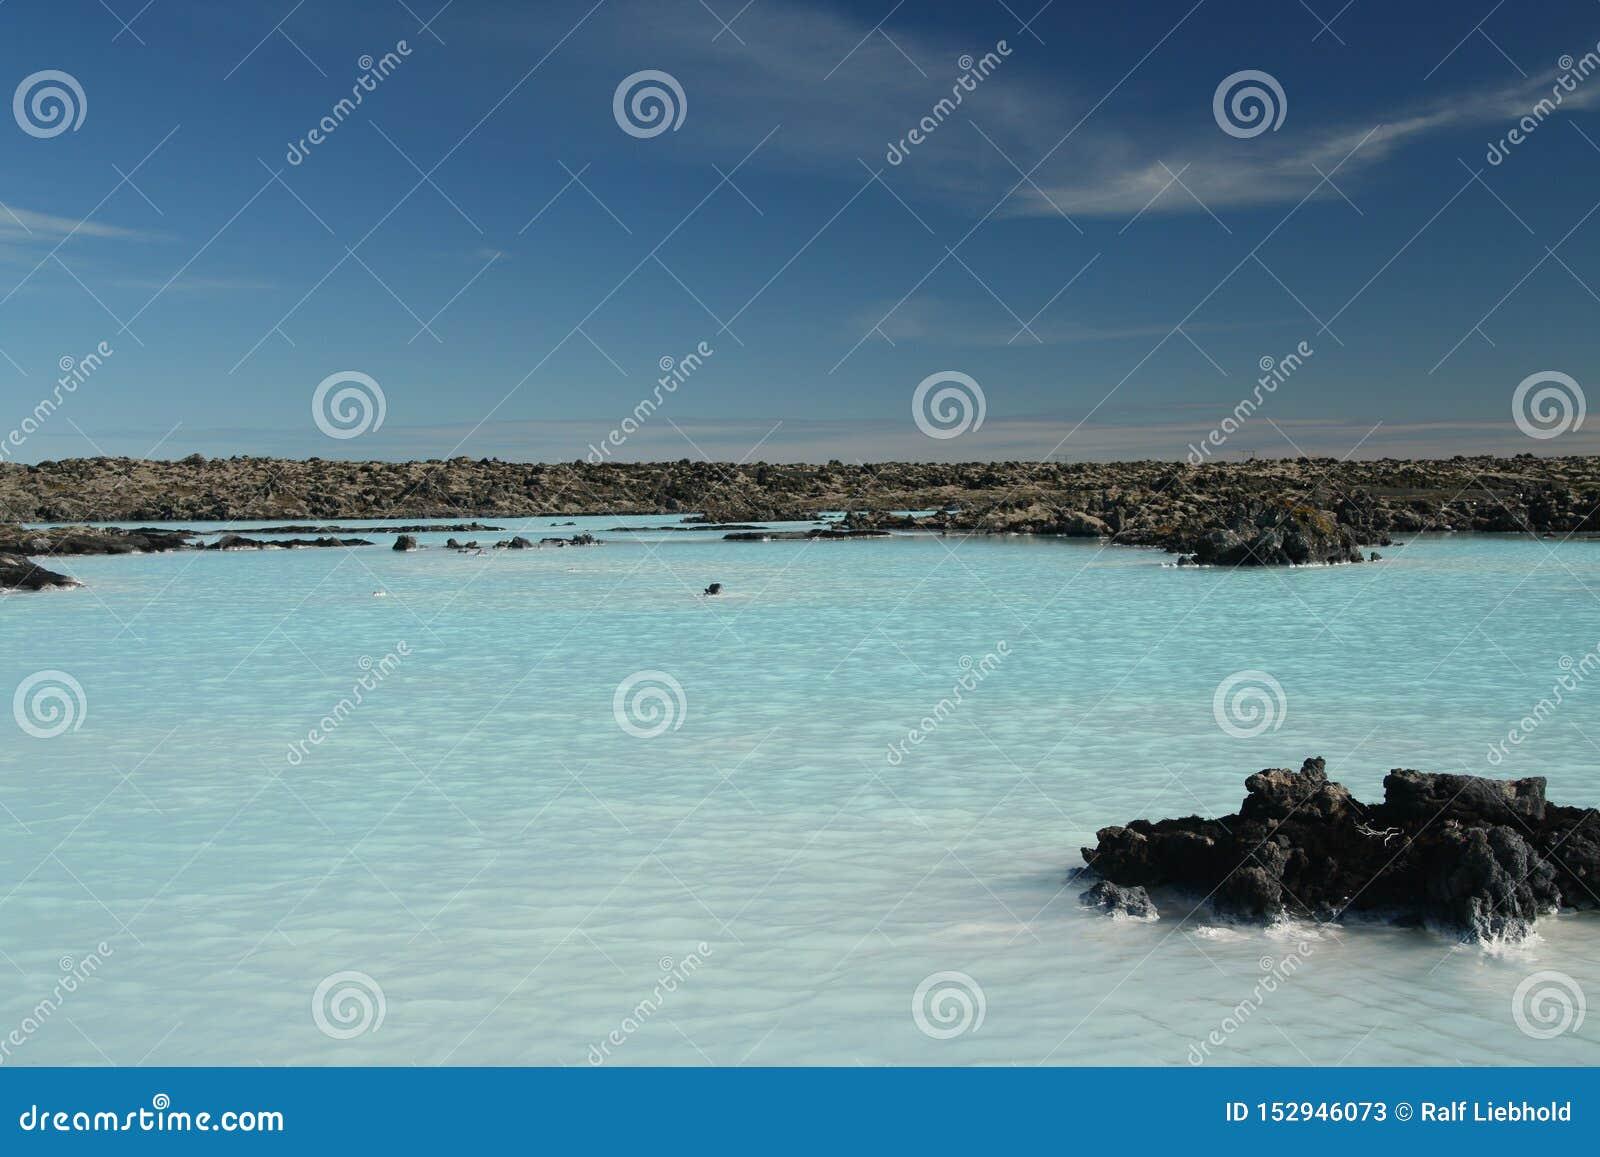 Blauwe Lagune Grindavik Bláa Lónið - de blauwe kleur komt uit silicaten wijzend op licht, IJsland